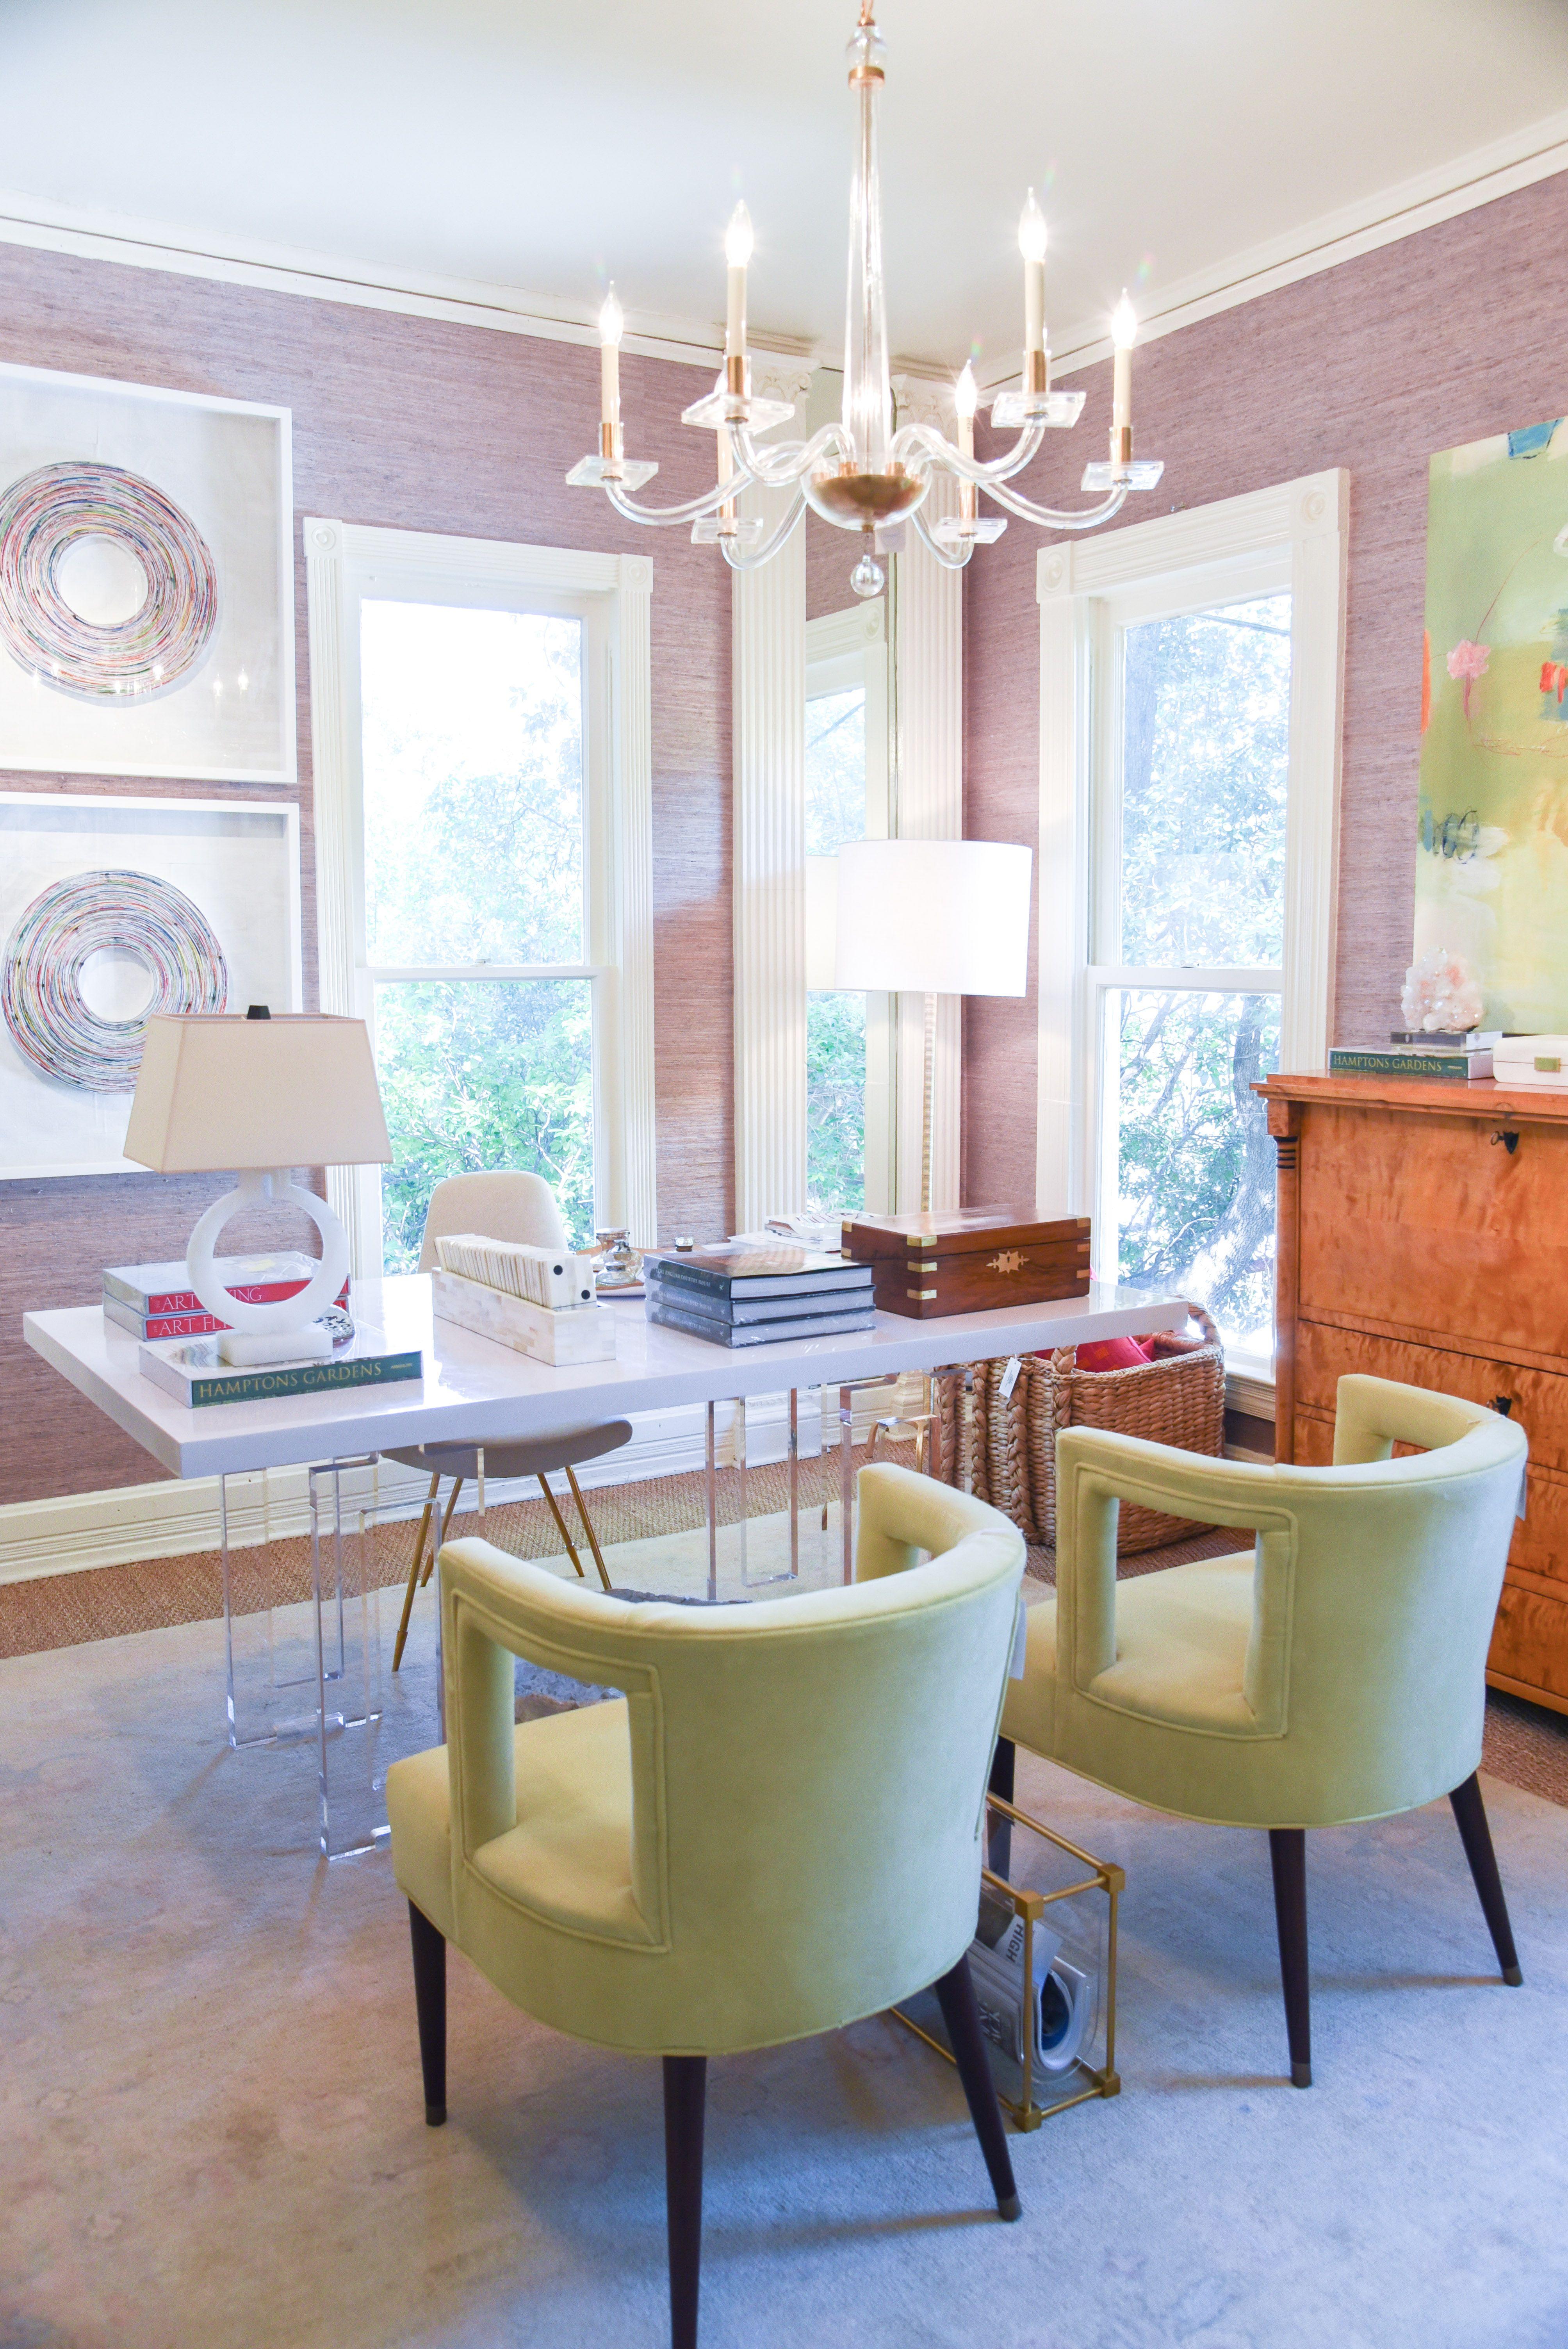 Best Office Design With Lavender Walls Biedermeier Chest 400 x 300